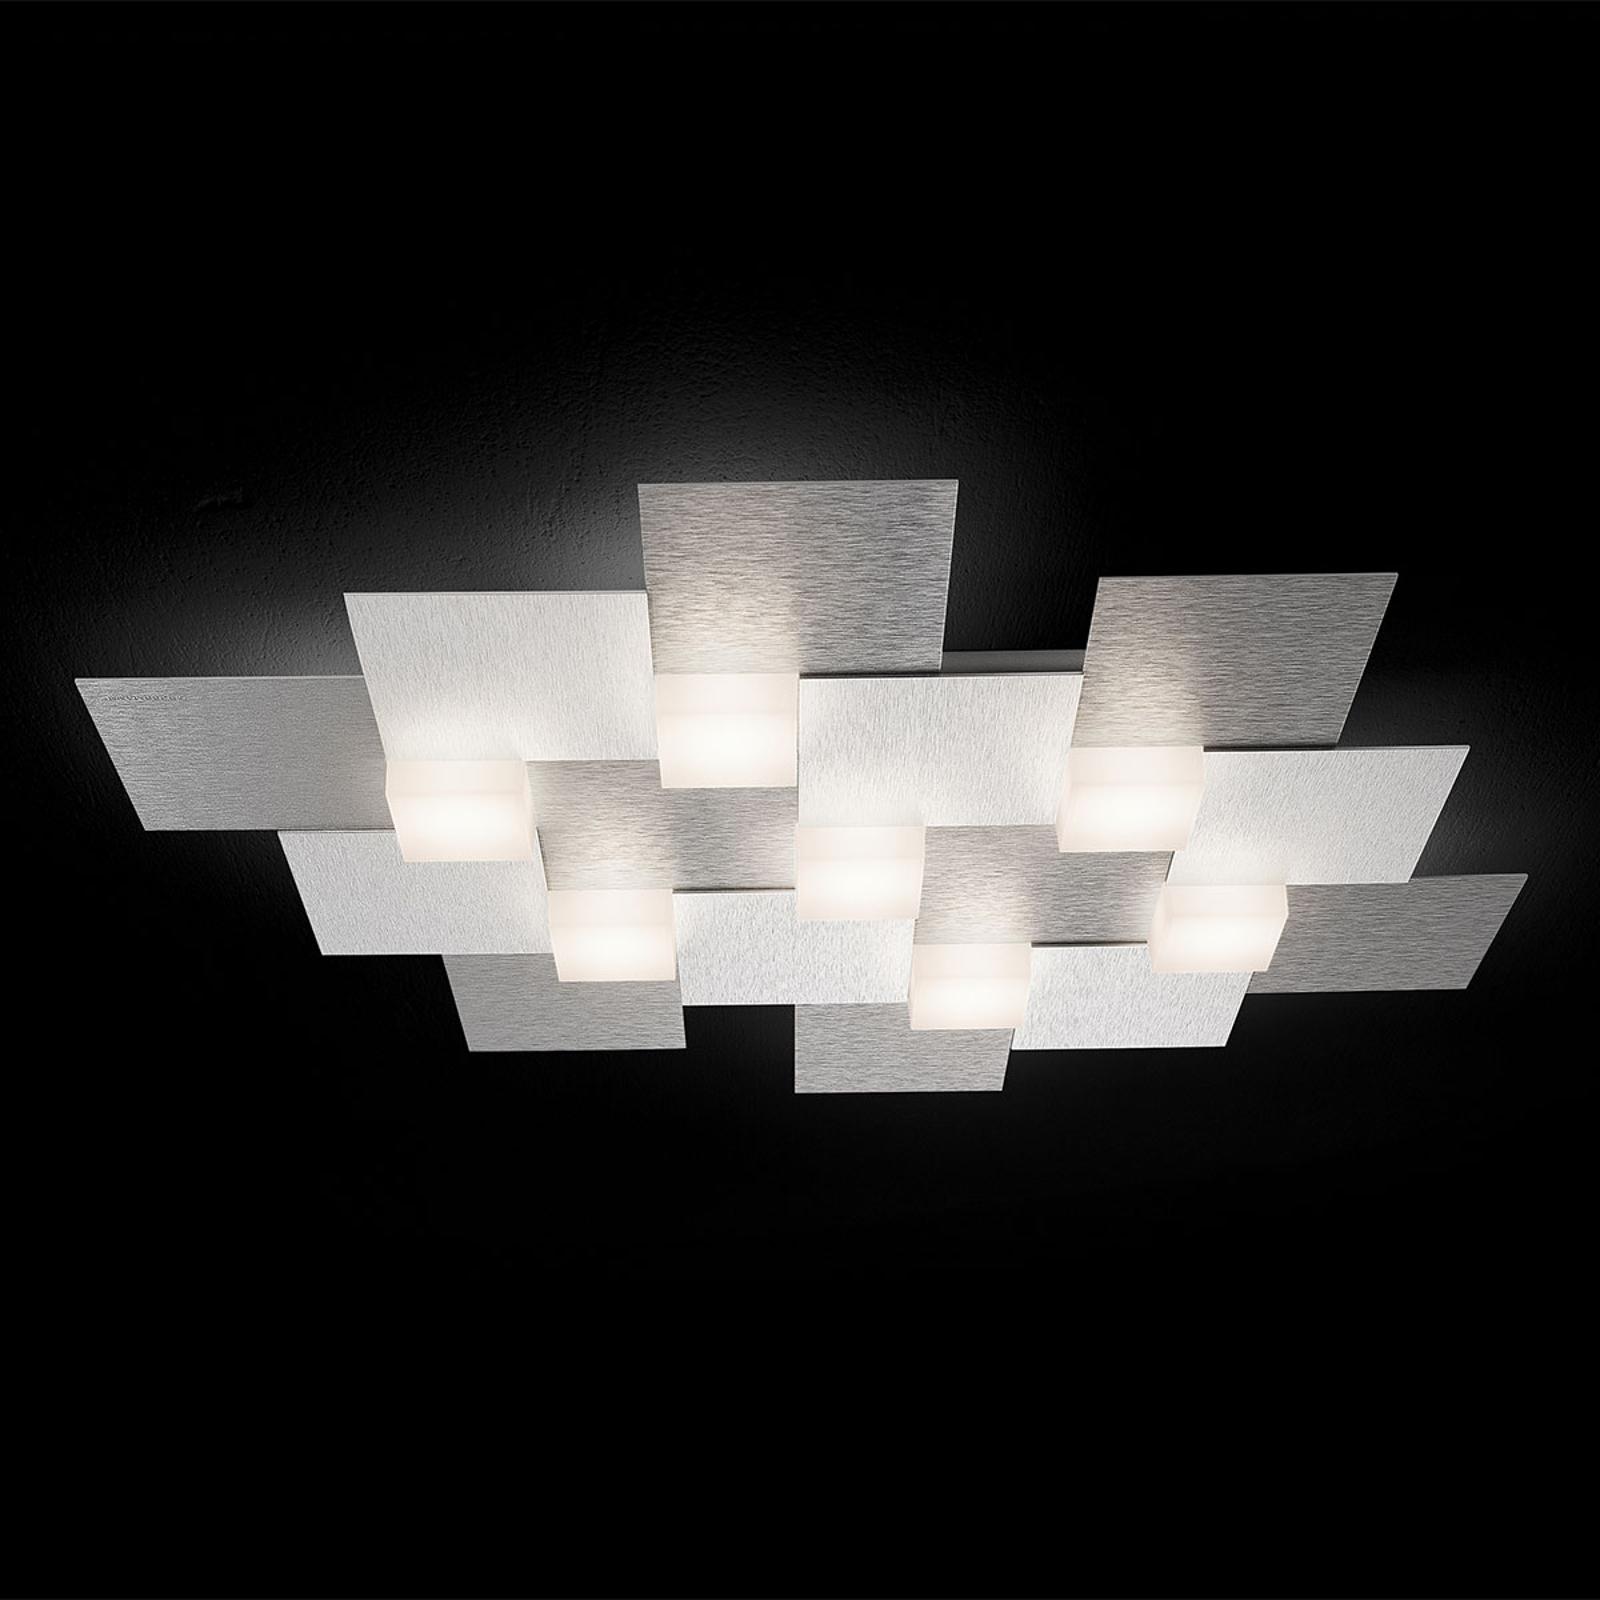 GROSSMANN Creo LED-Deckenleuchte, 7fl. alu